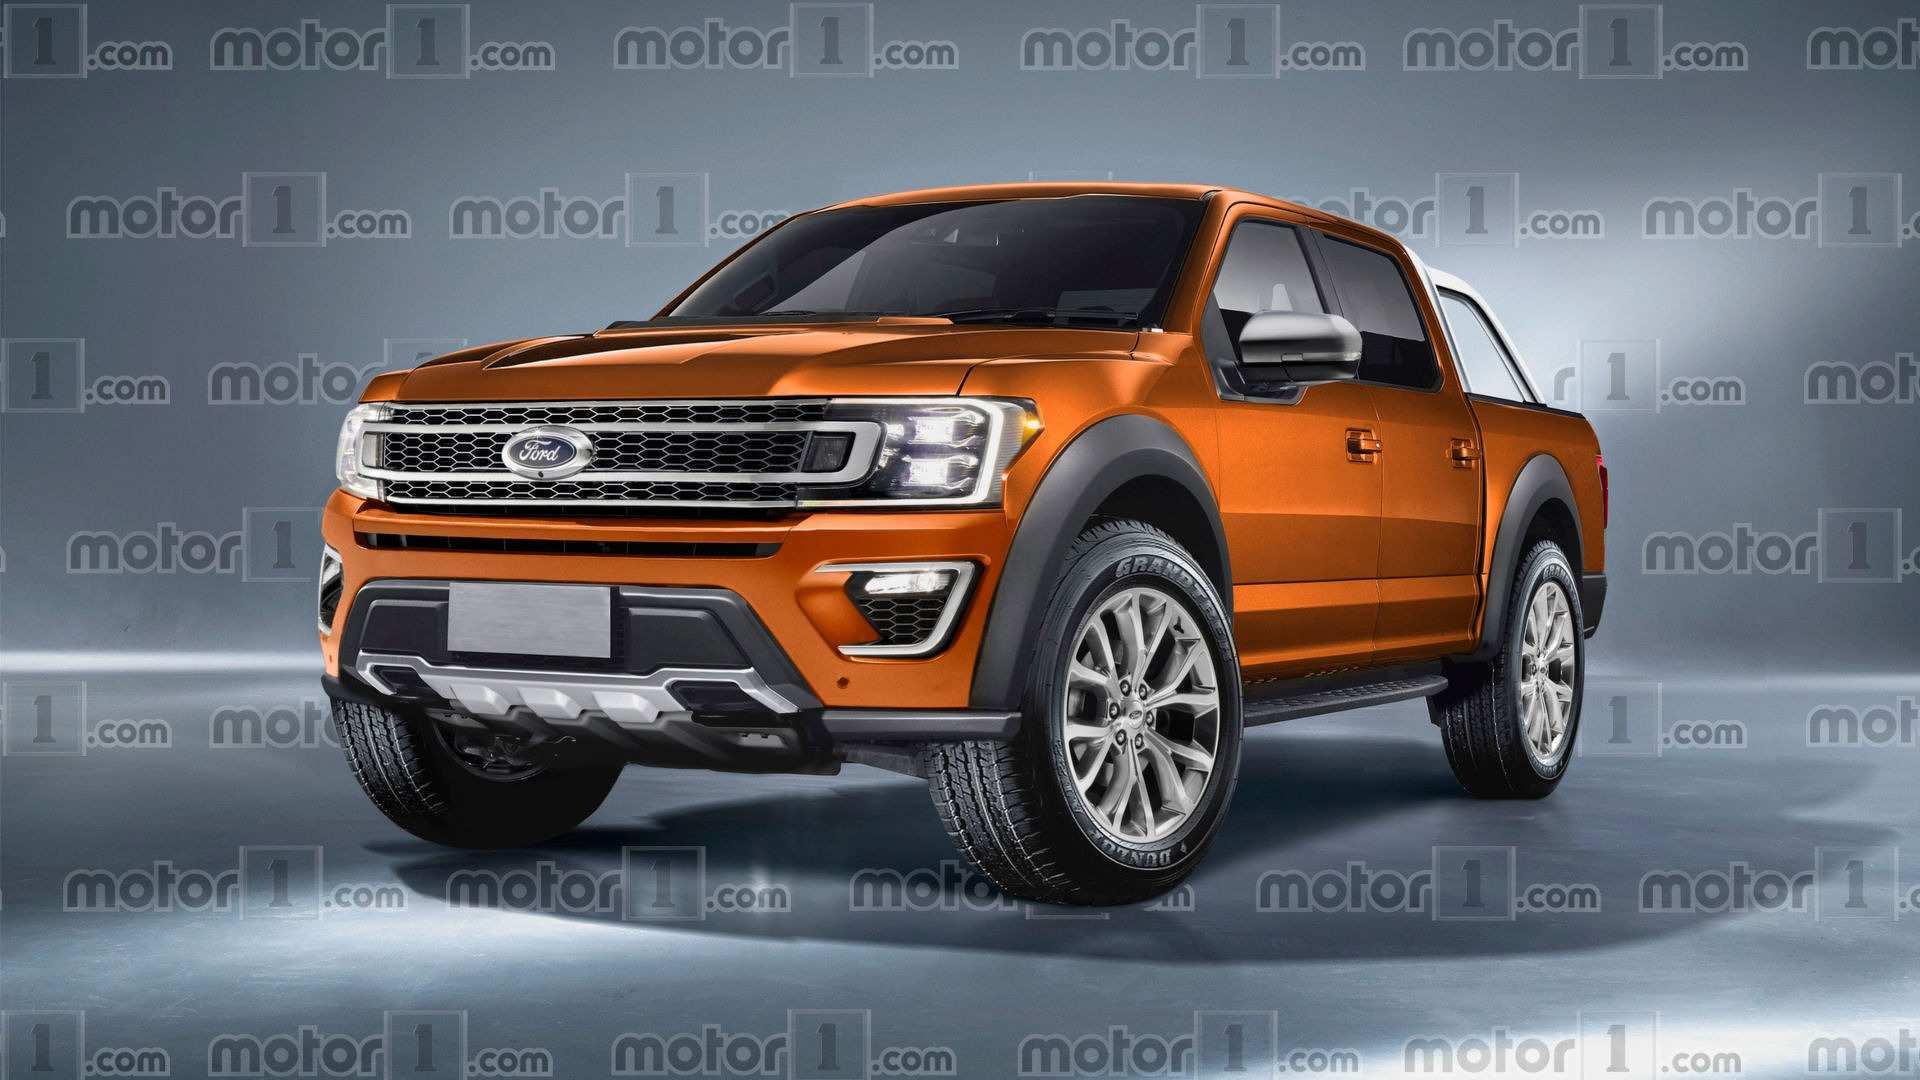 81 All New 2020 Ford Ranger Wildtrak Interior by 2020 Ford Ranger Wildtrak